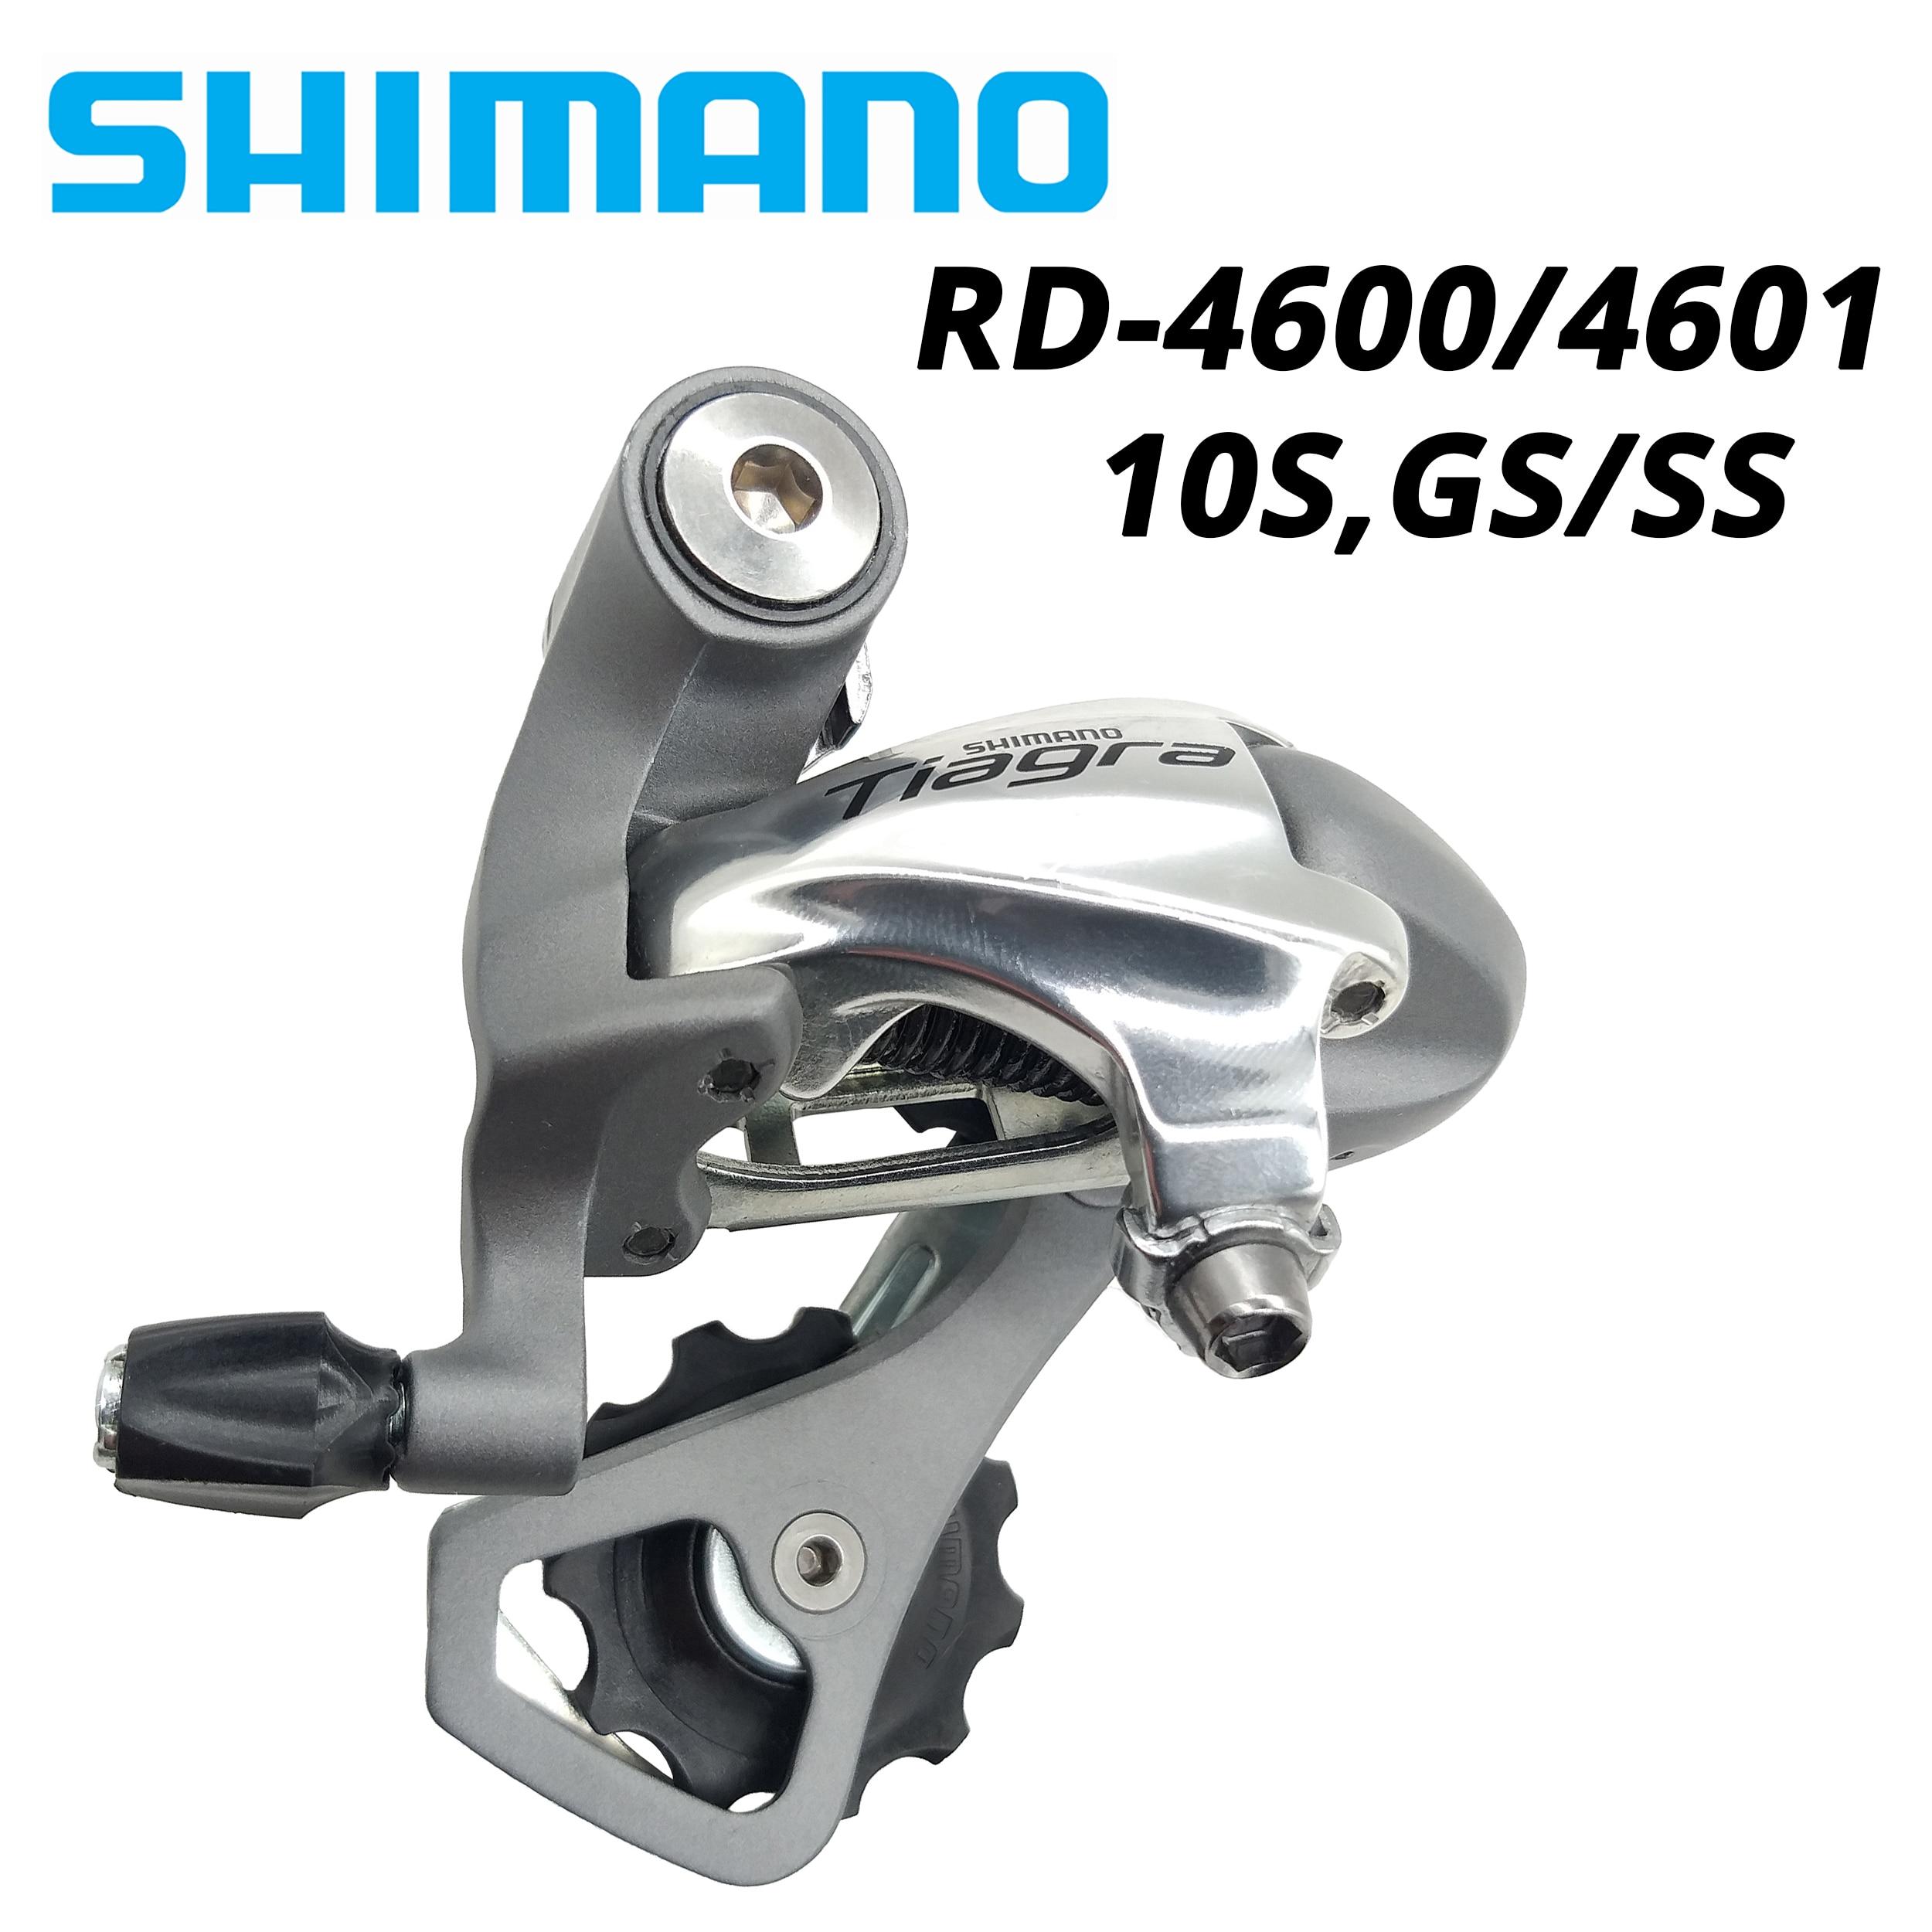 NEW Shimano Tiagra RD-4601-SS 10-Speed Road Rear Derailleur Short Cage Silver